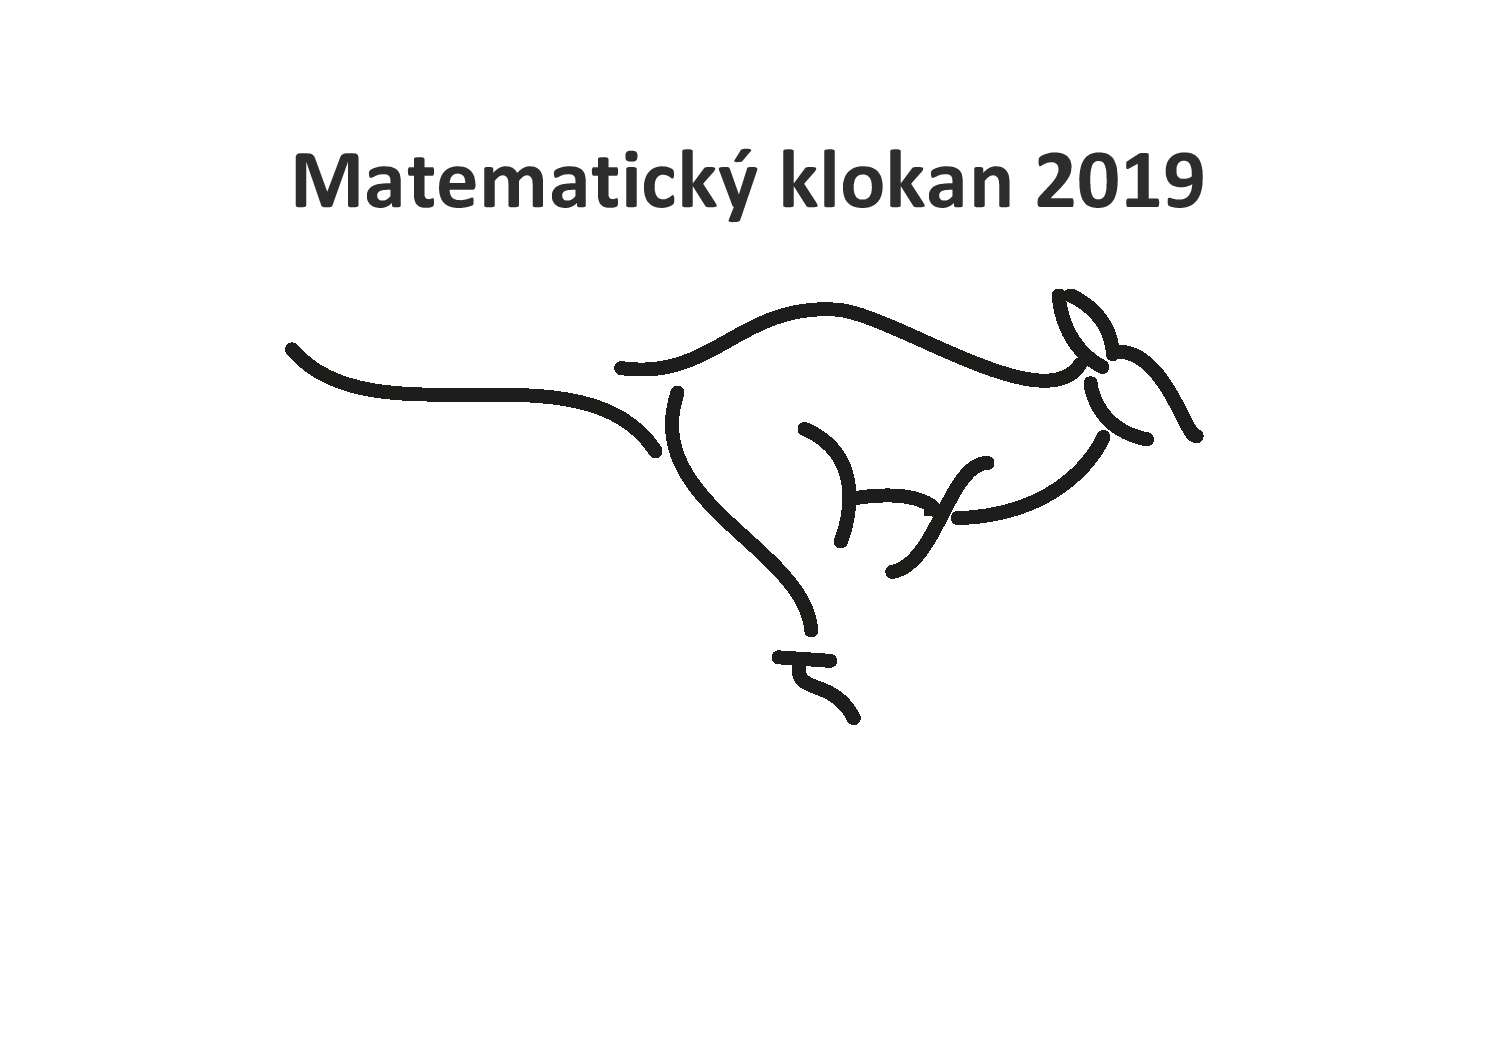 MATEMATICKÝ KLOKAN 2019